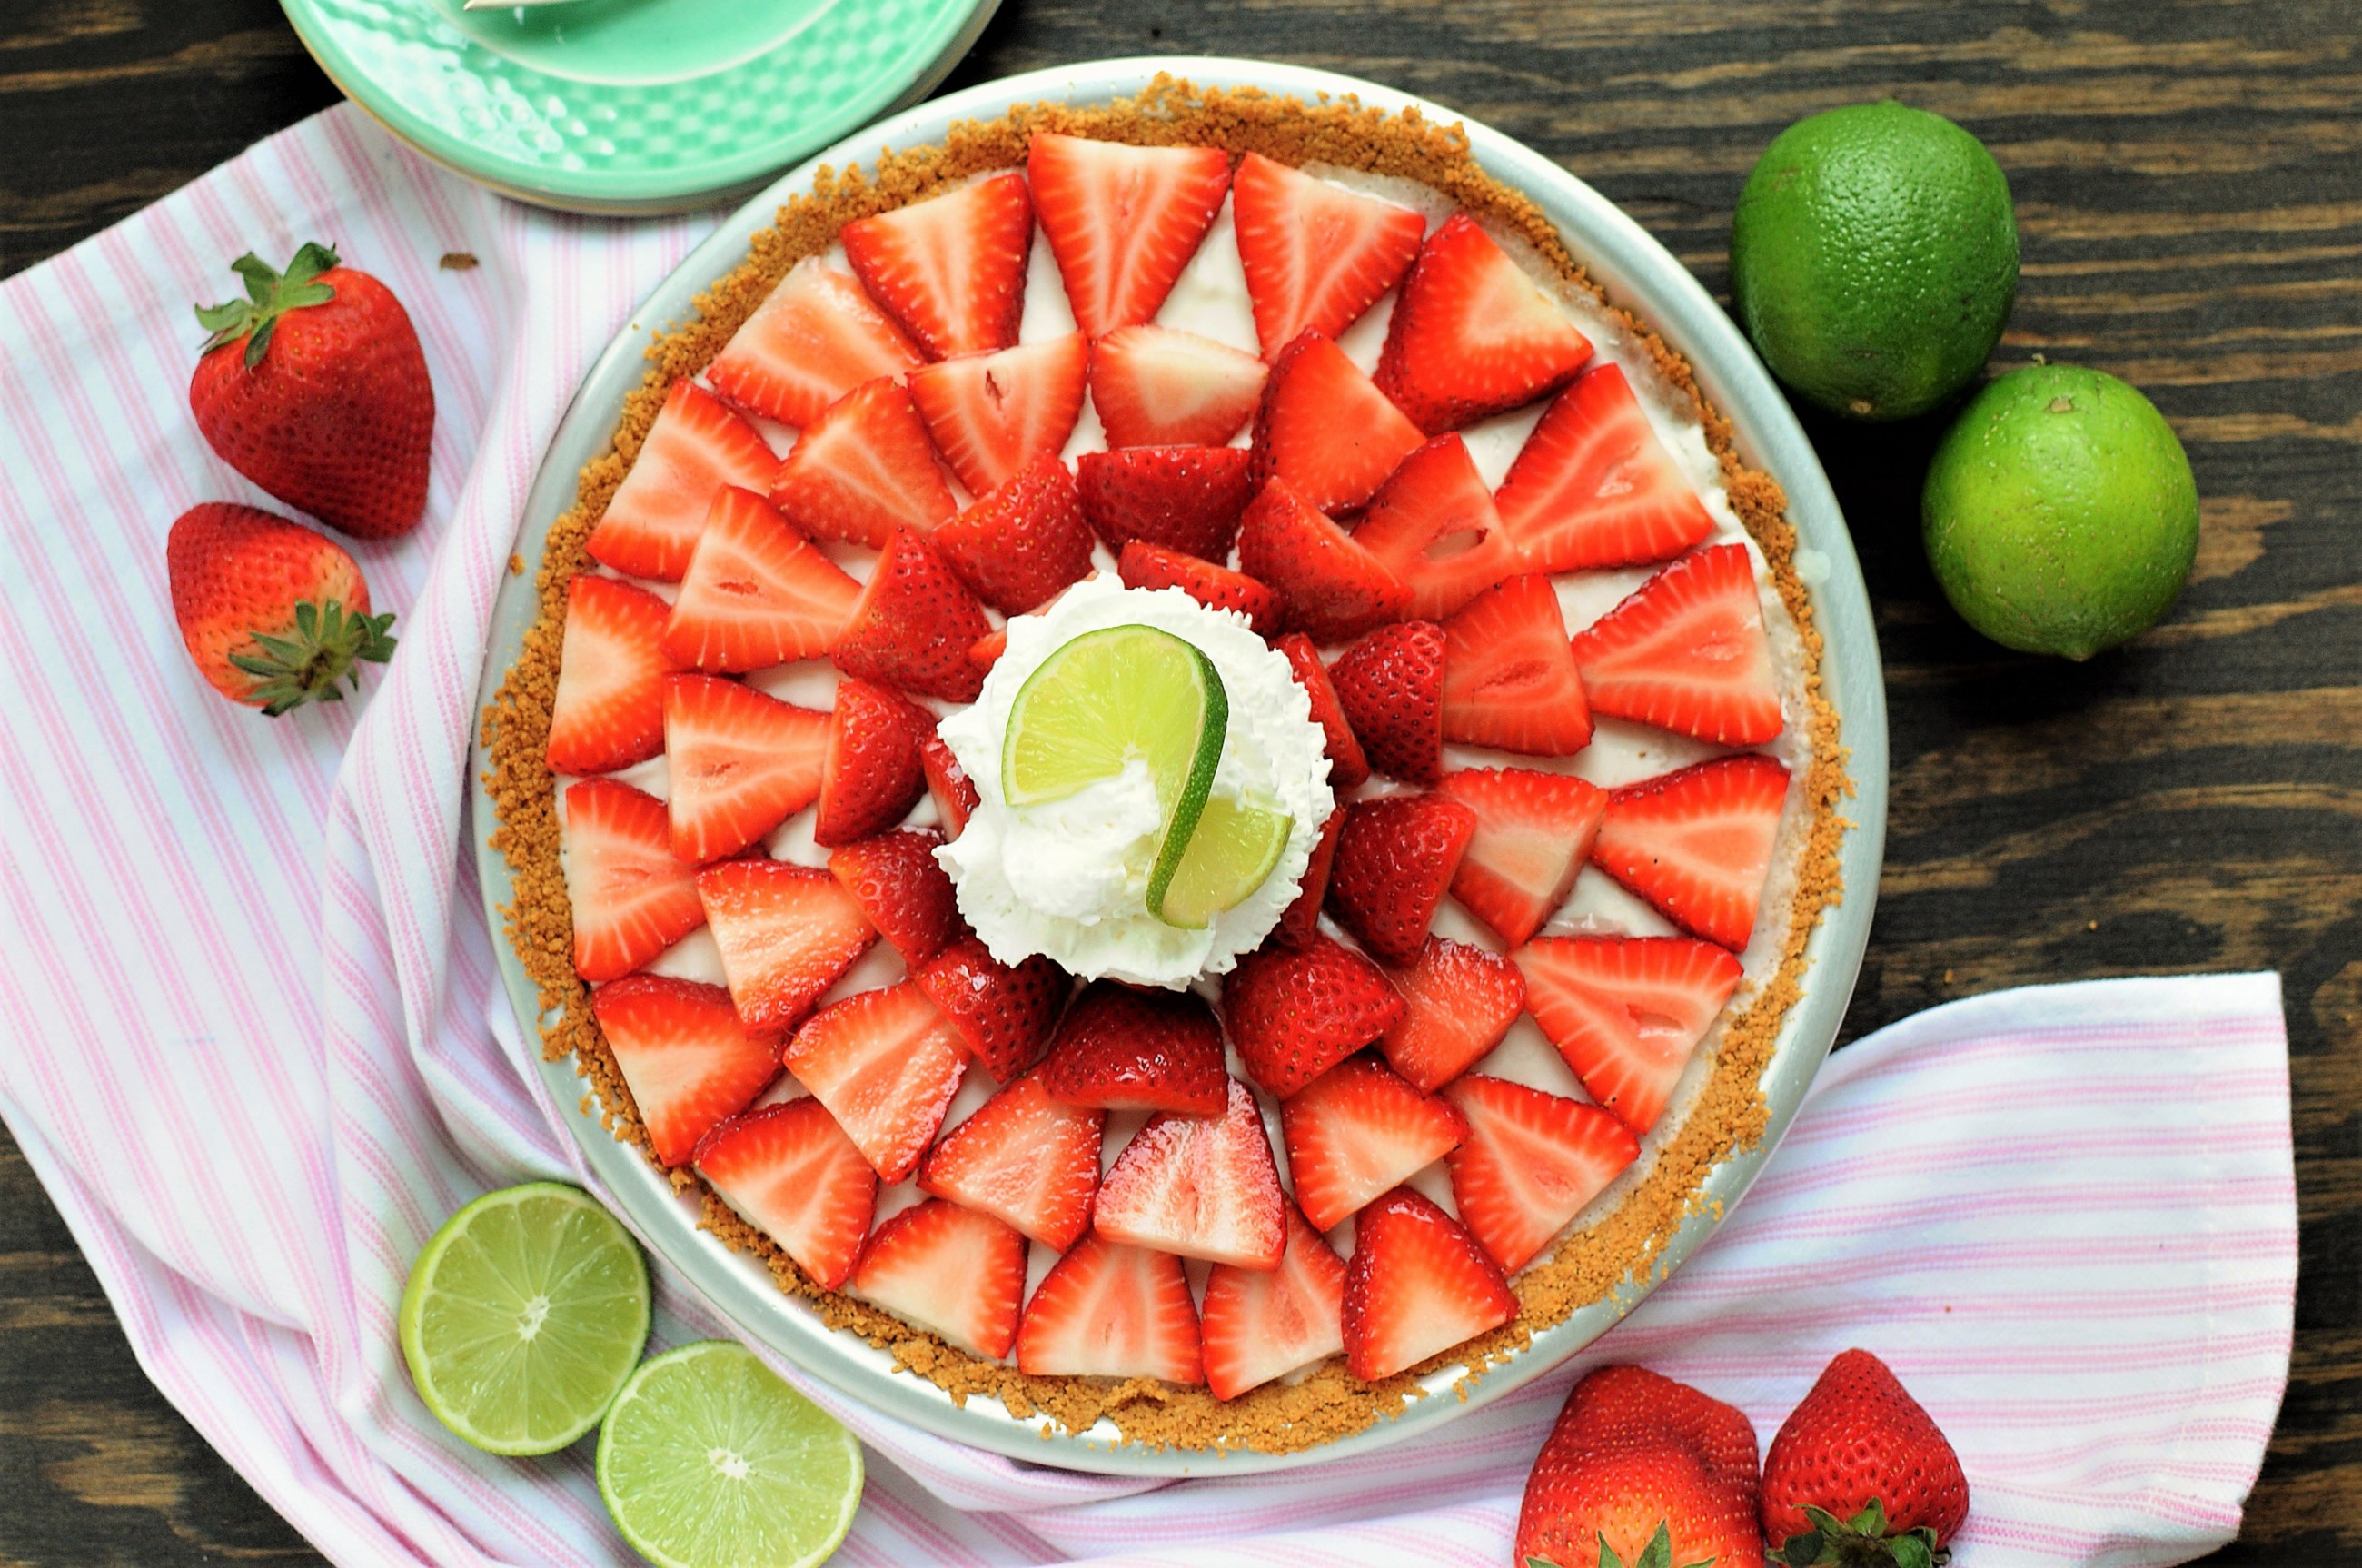 ricetta-del-mese-torta-light-allo-yogurt-e-fragole